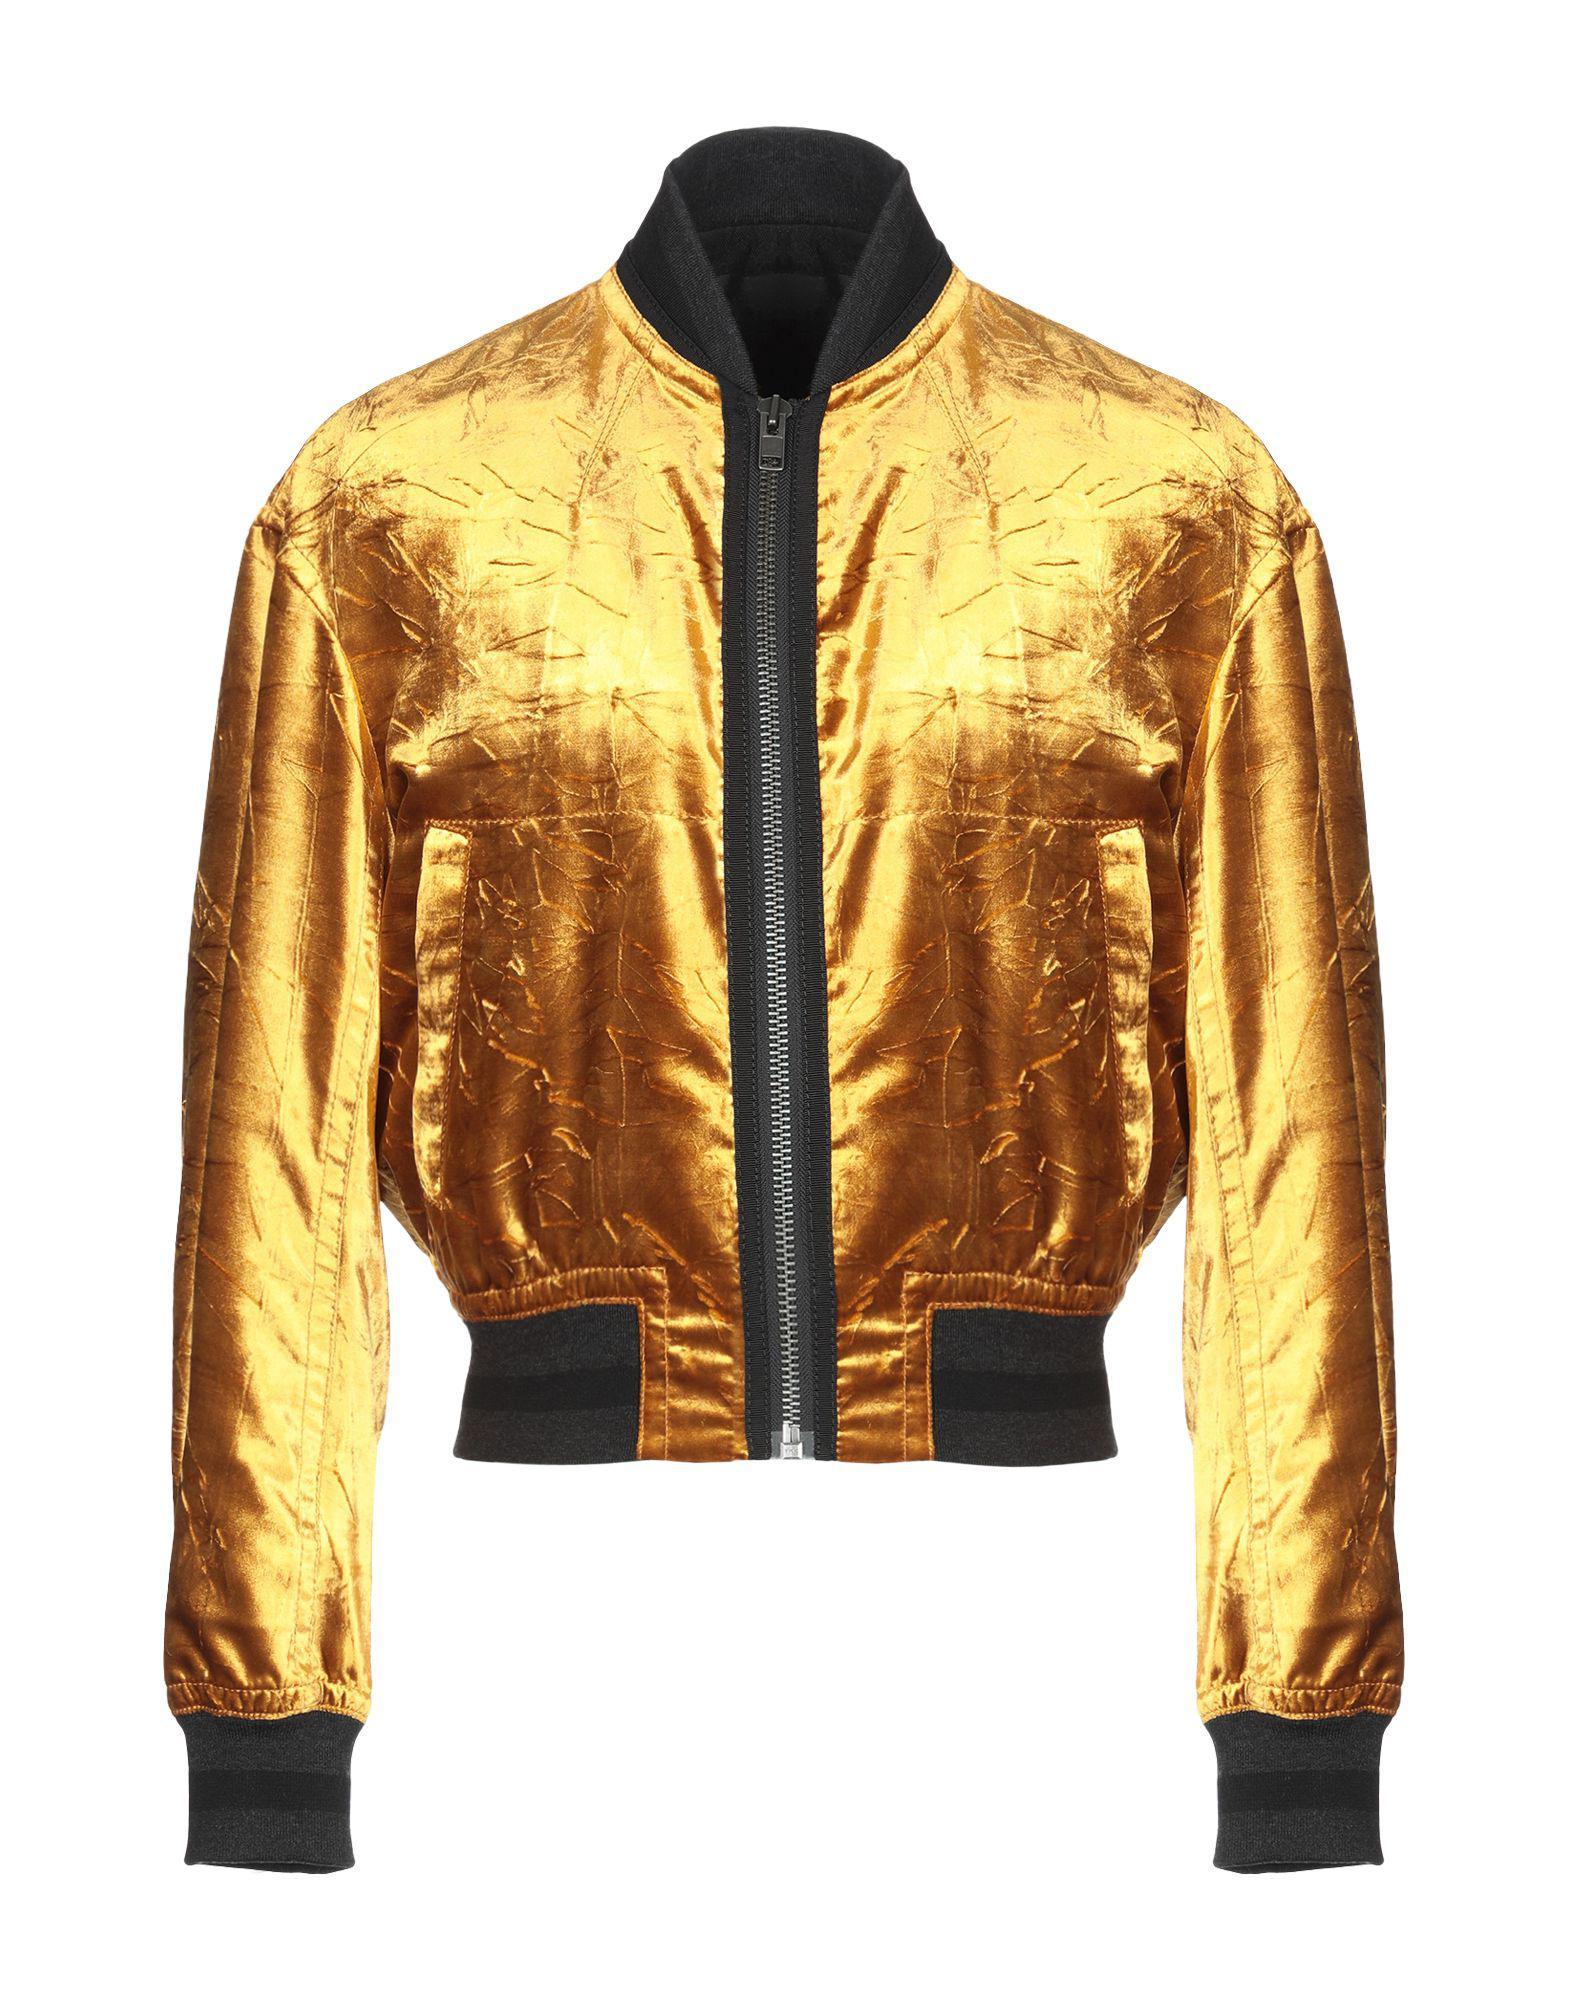 8f4f1b986 Lyst - Haider Ackermann Jacket for Men